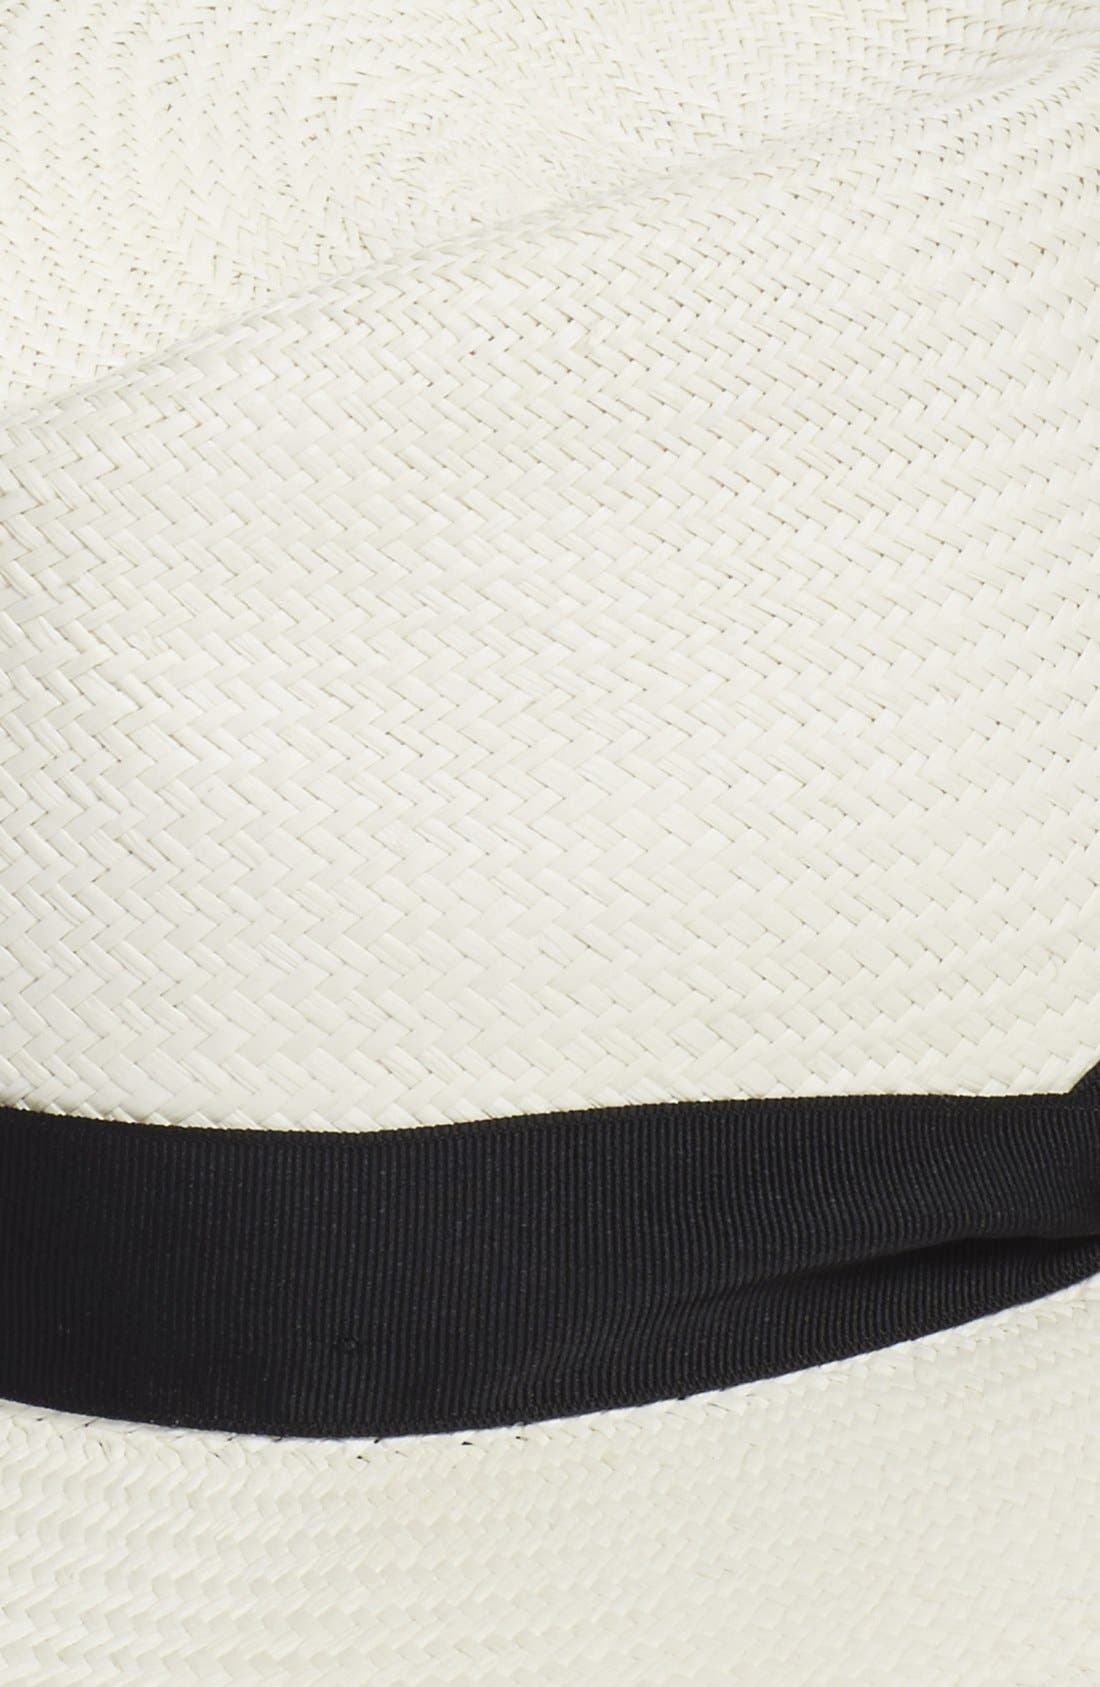 RAG & BONE, Straw Panama Hat, Alternate thumbnail 4, color, WHITE